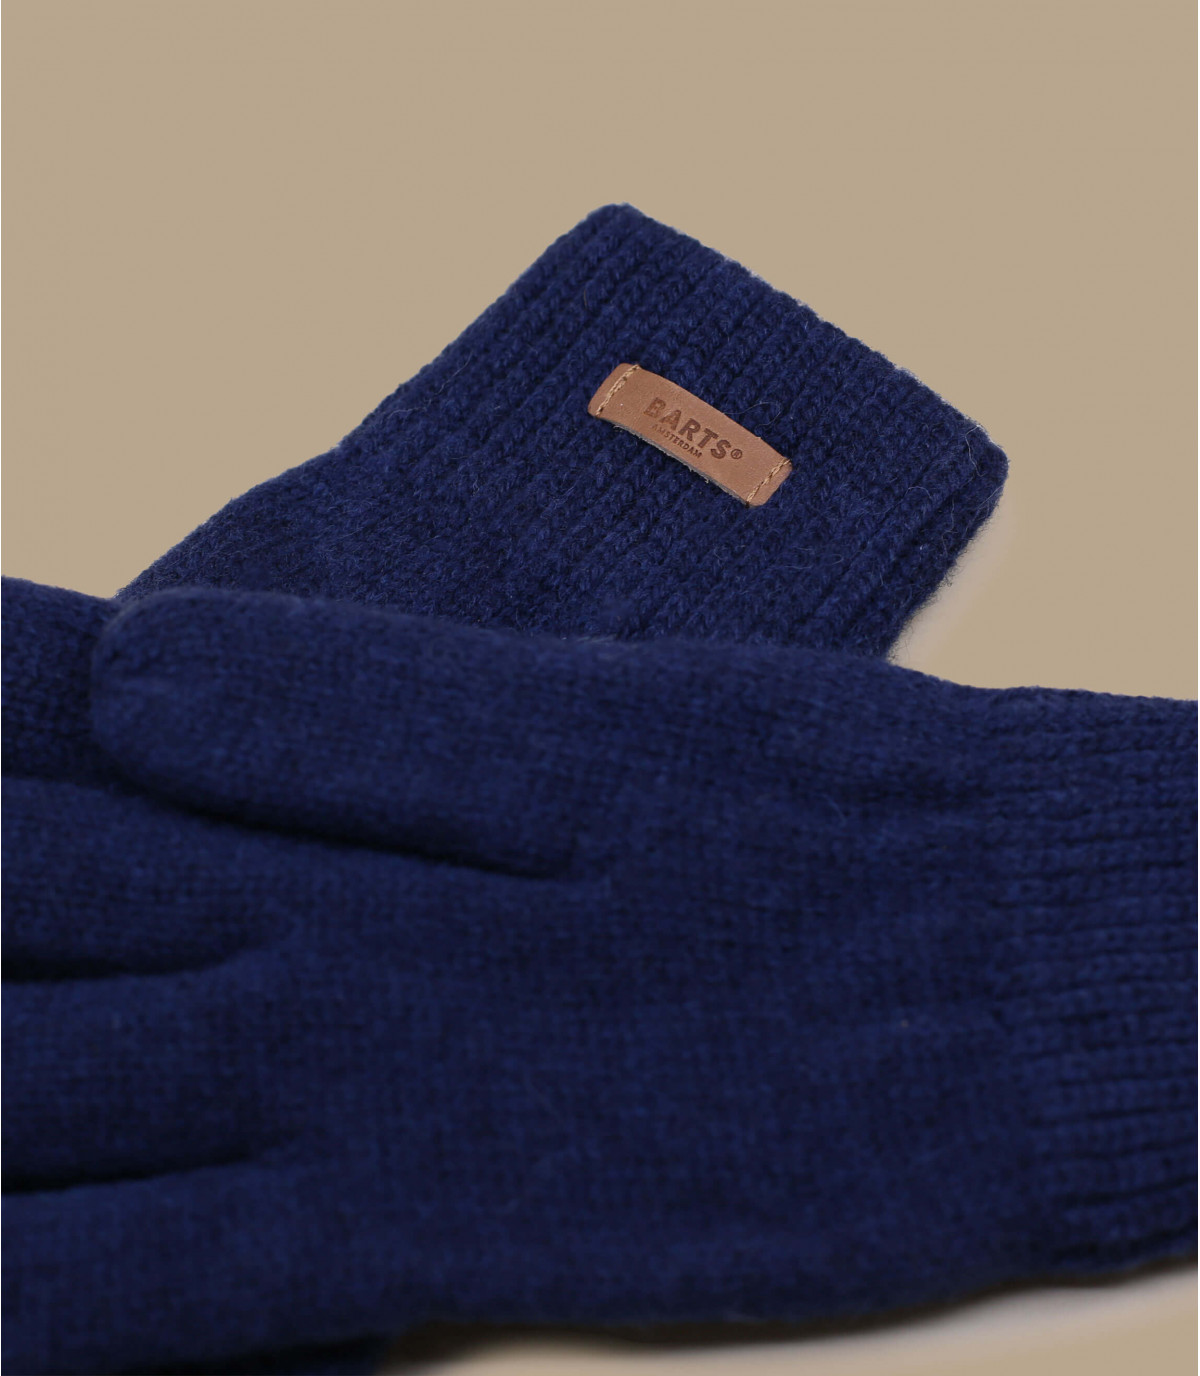 Gants en laine bleu marine